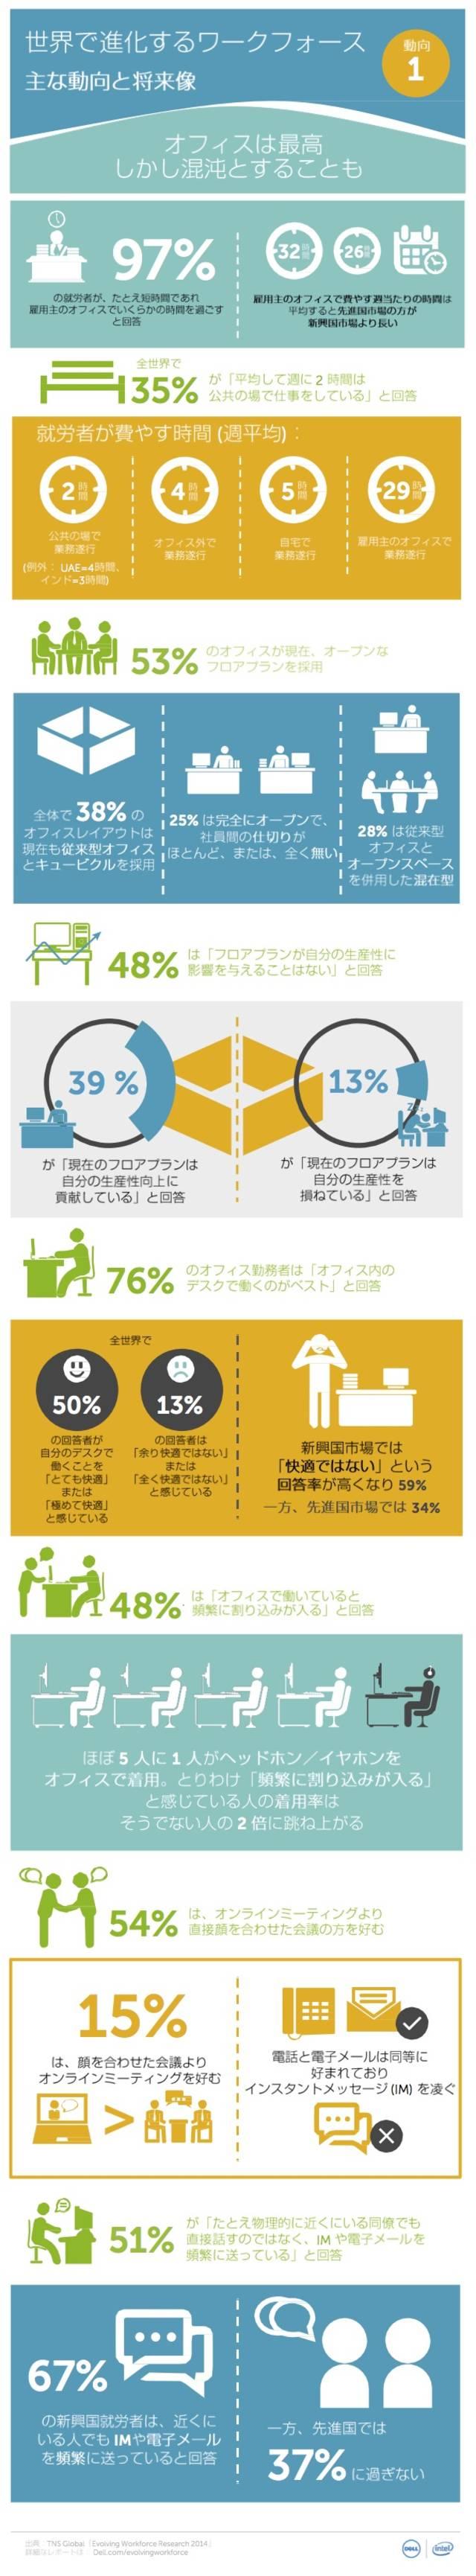 Infographics evolving workforce office 2014 j